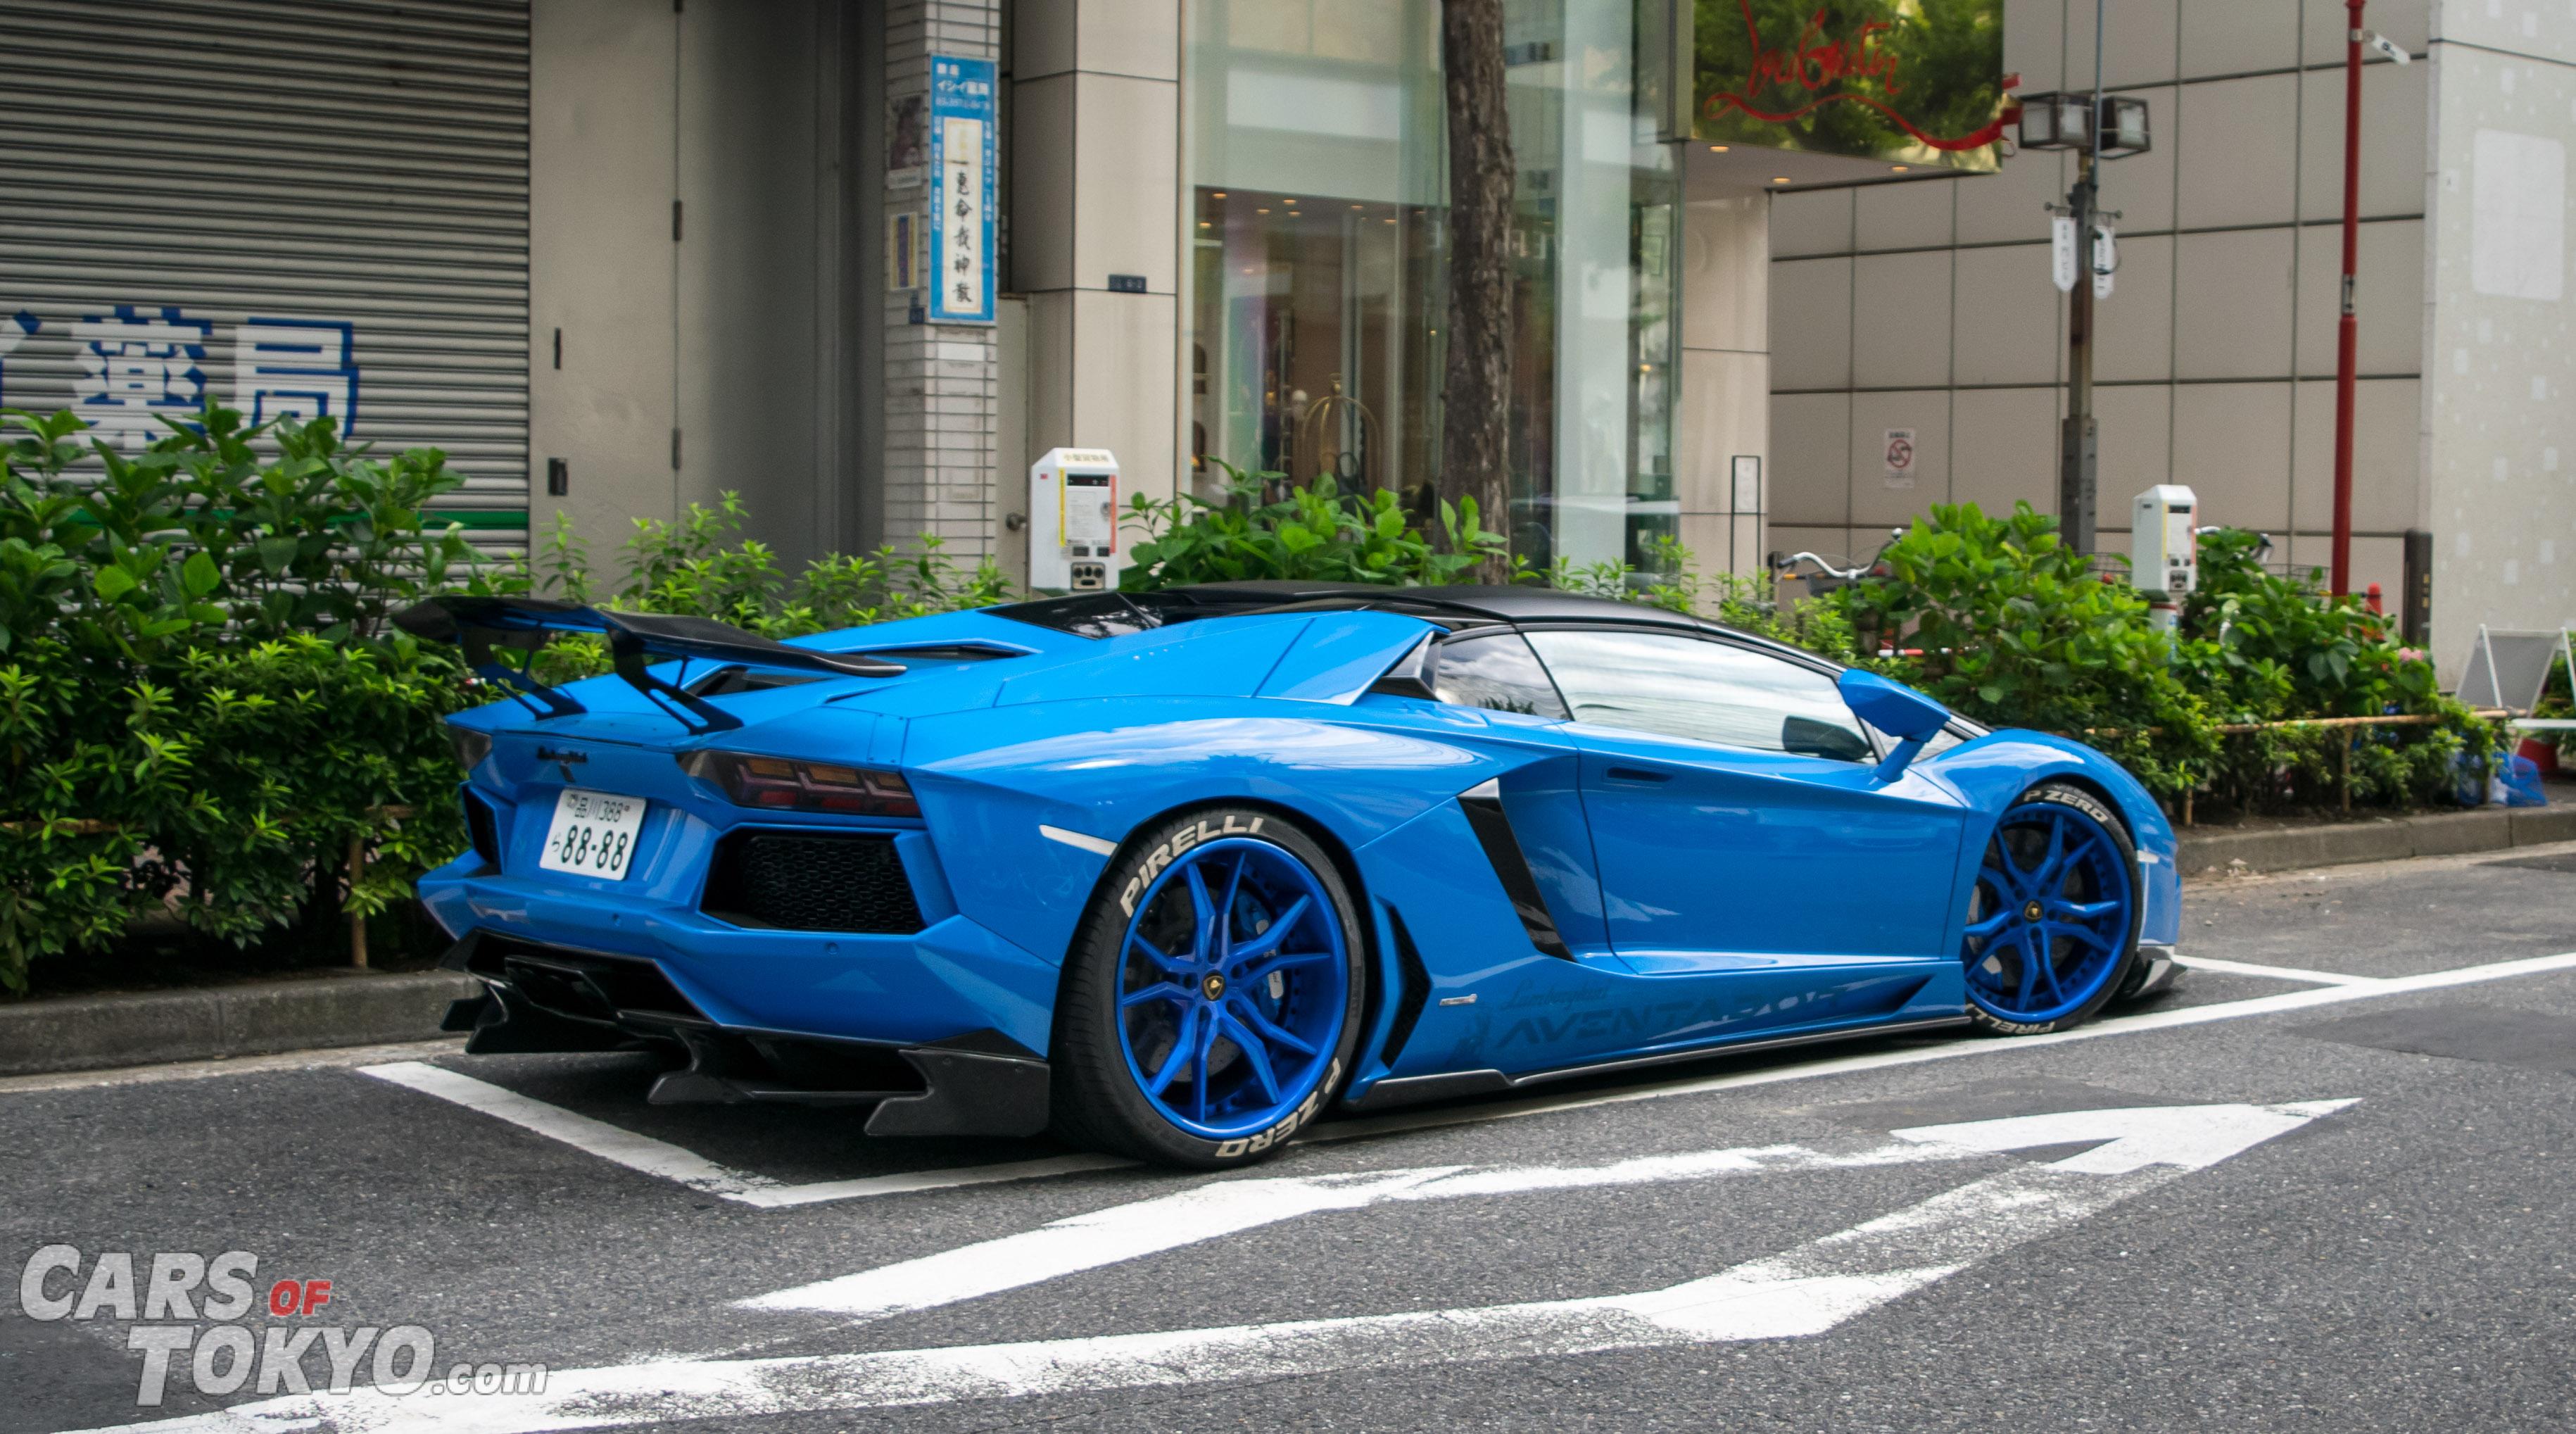 Cars of Tokyo Ginza Lamborghini Aventador Roadster